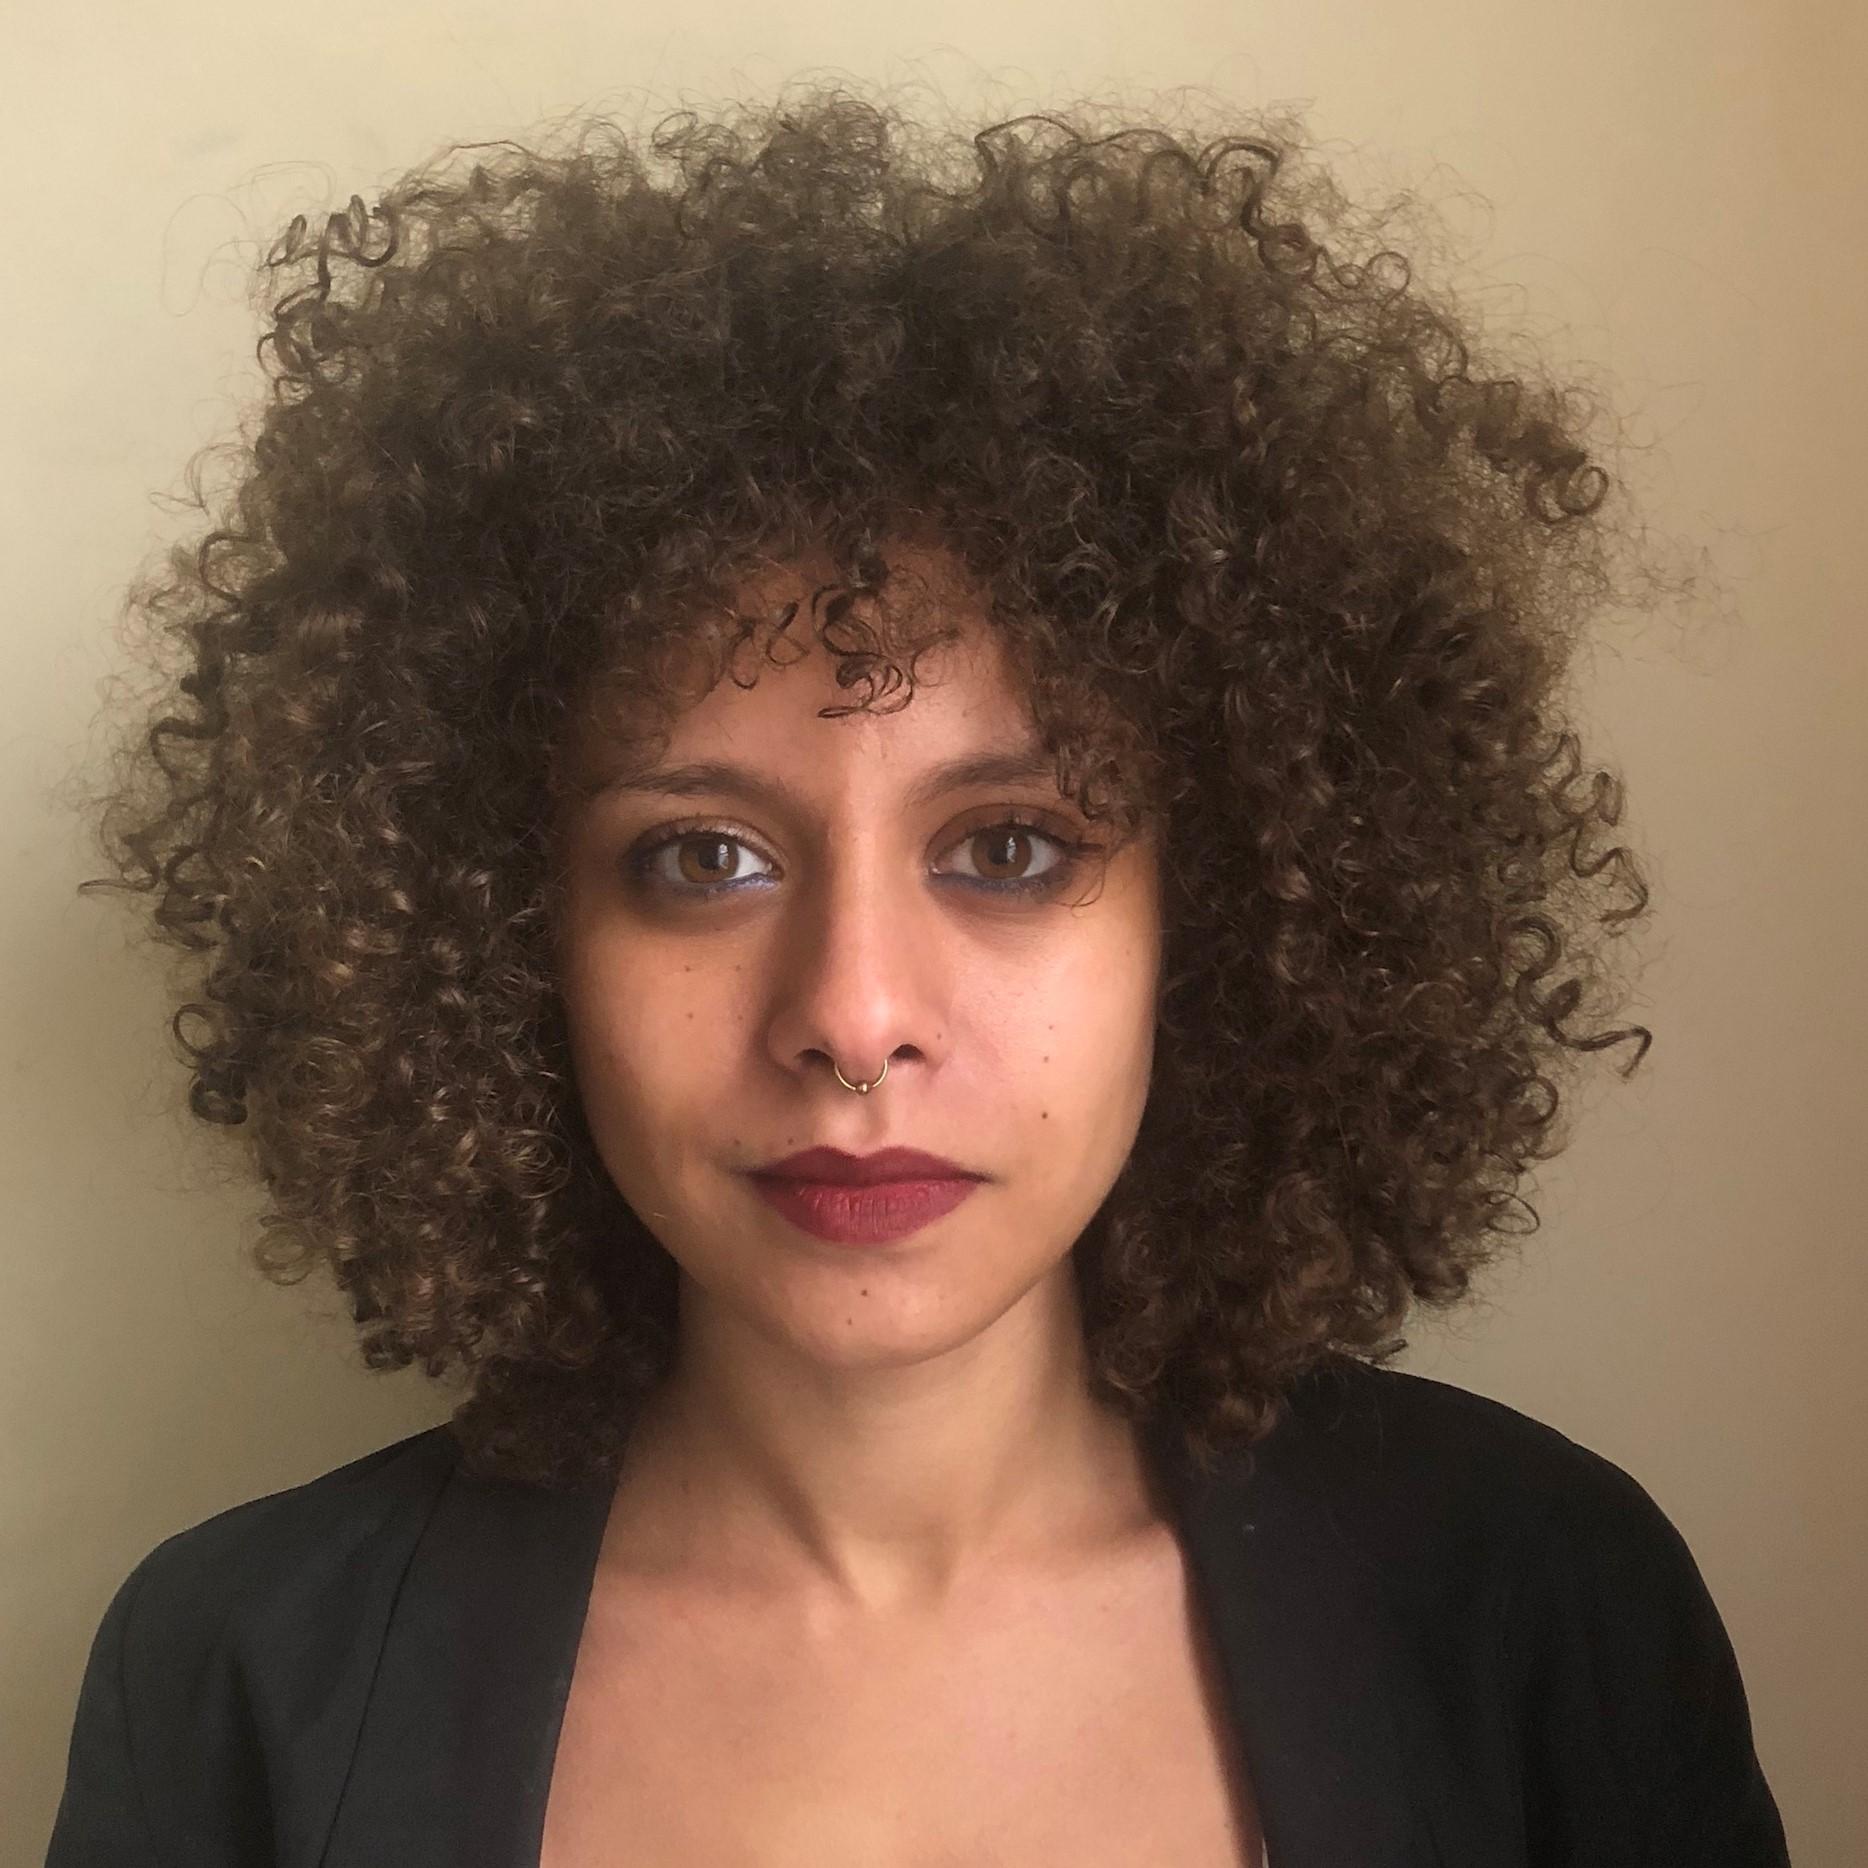 Hannah Elsisi Ashmawi